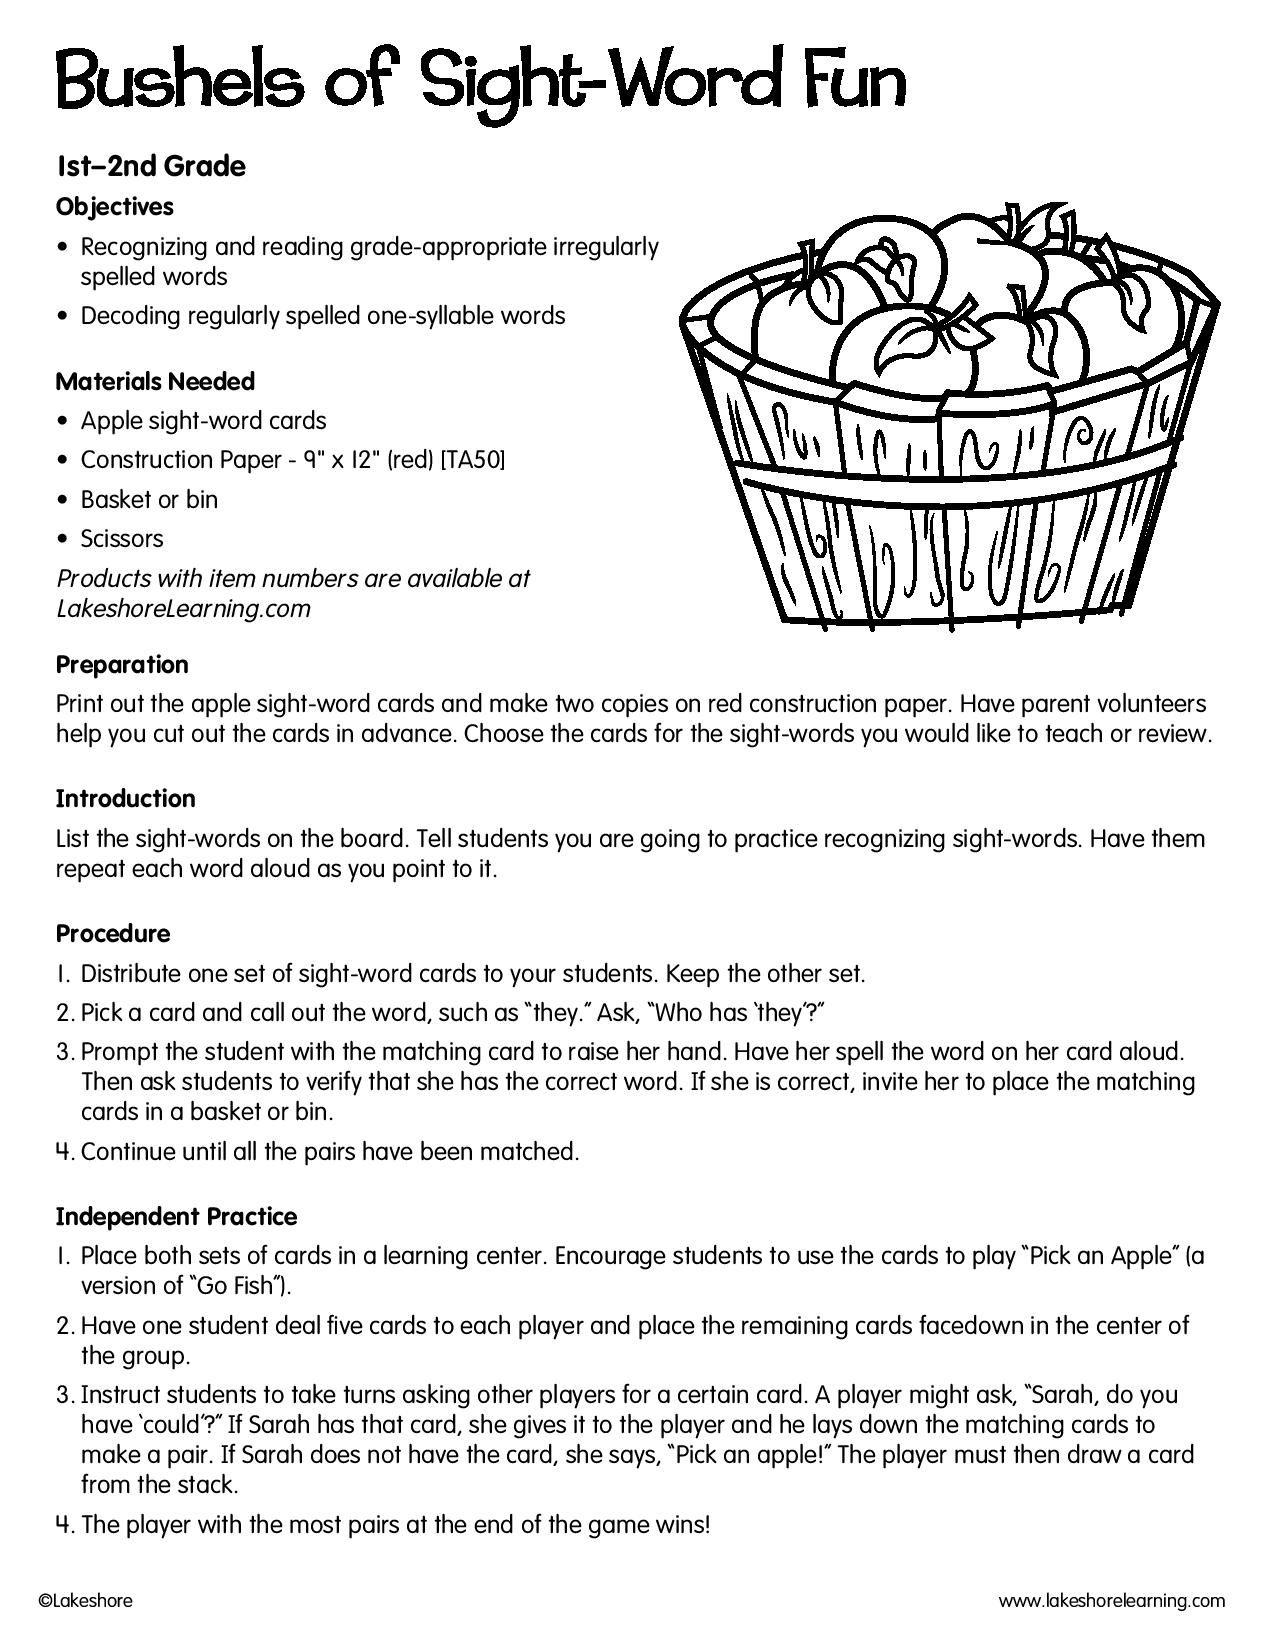 Bushels Of Sight Word Fun Lessonplan Sightwords